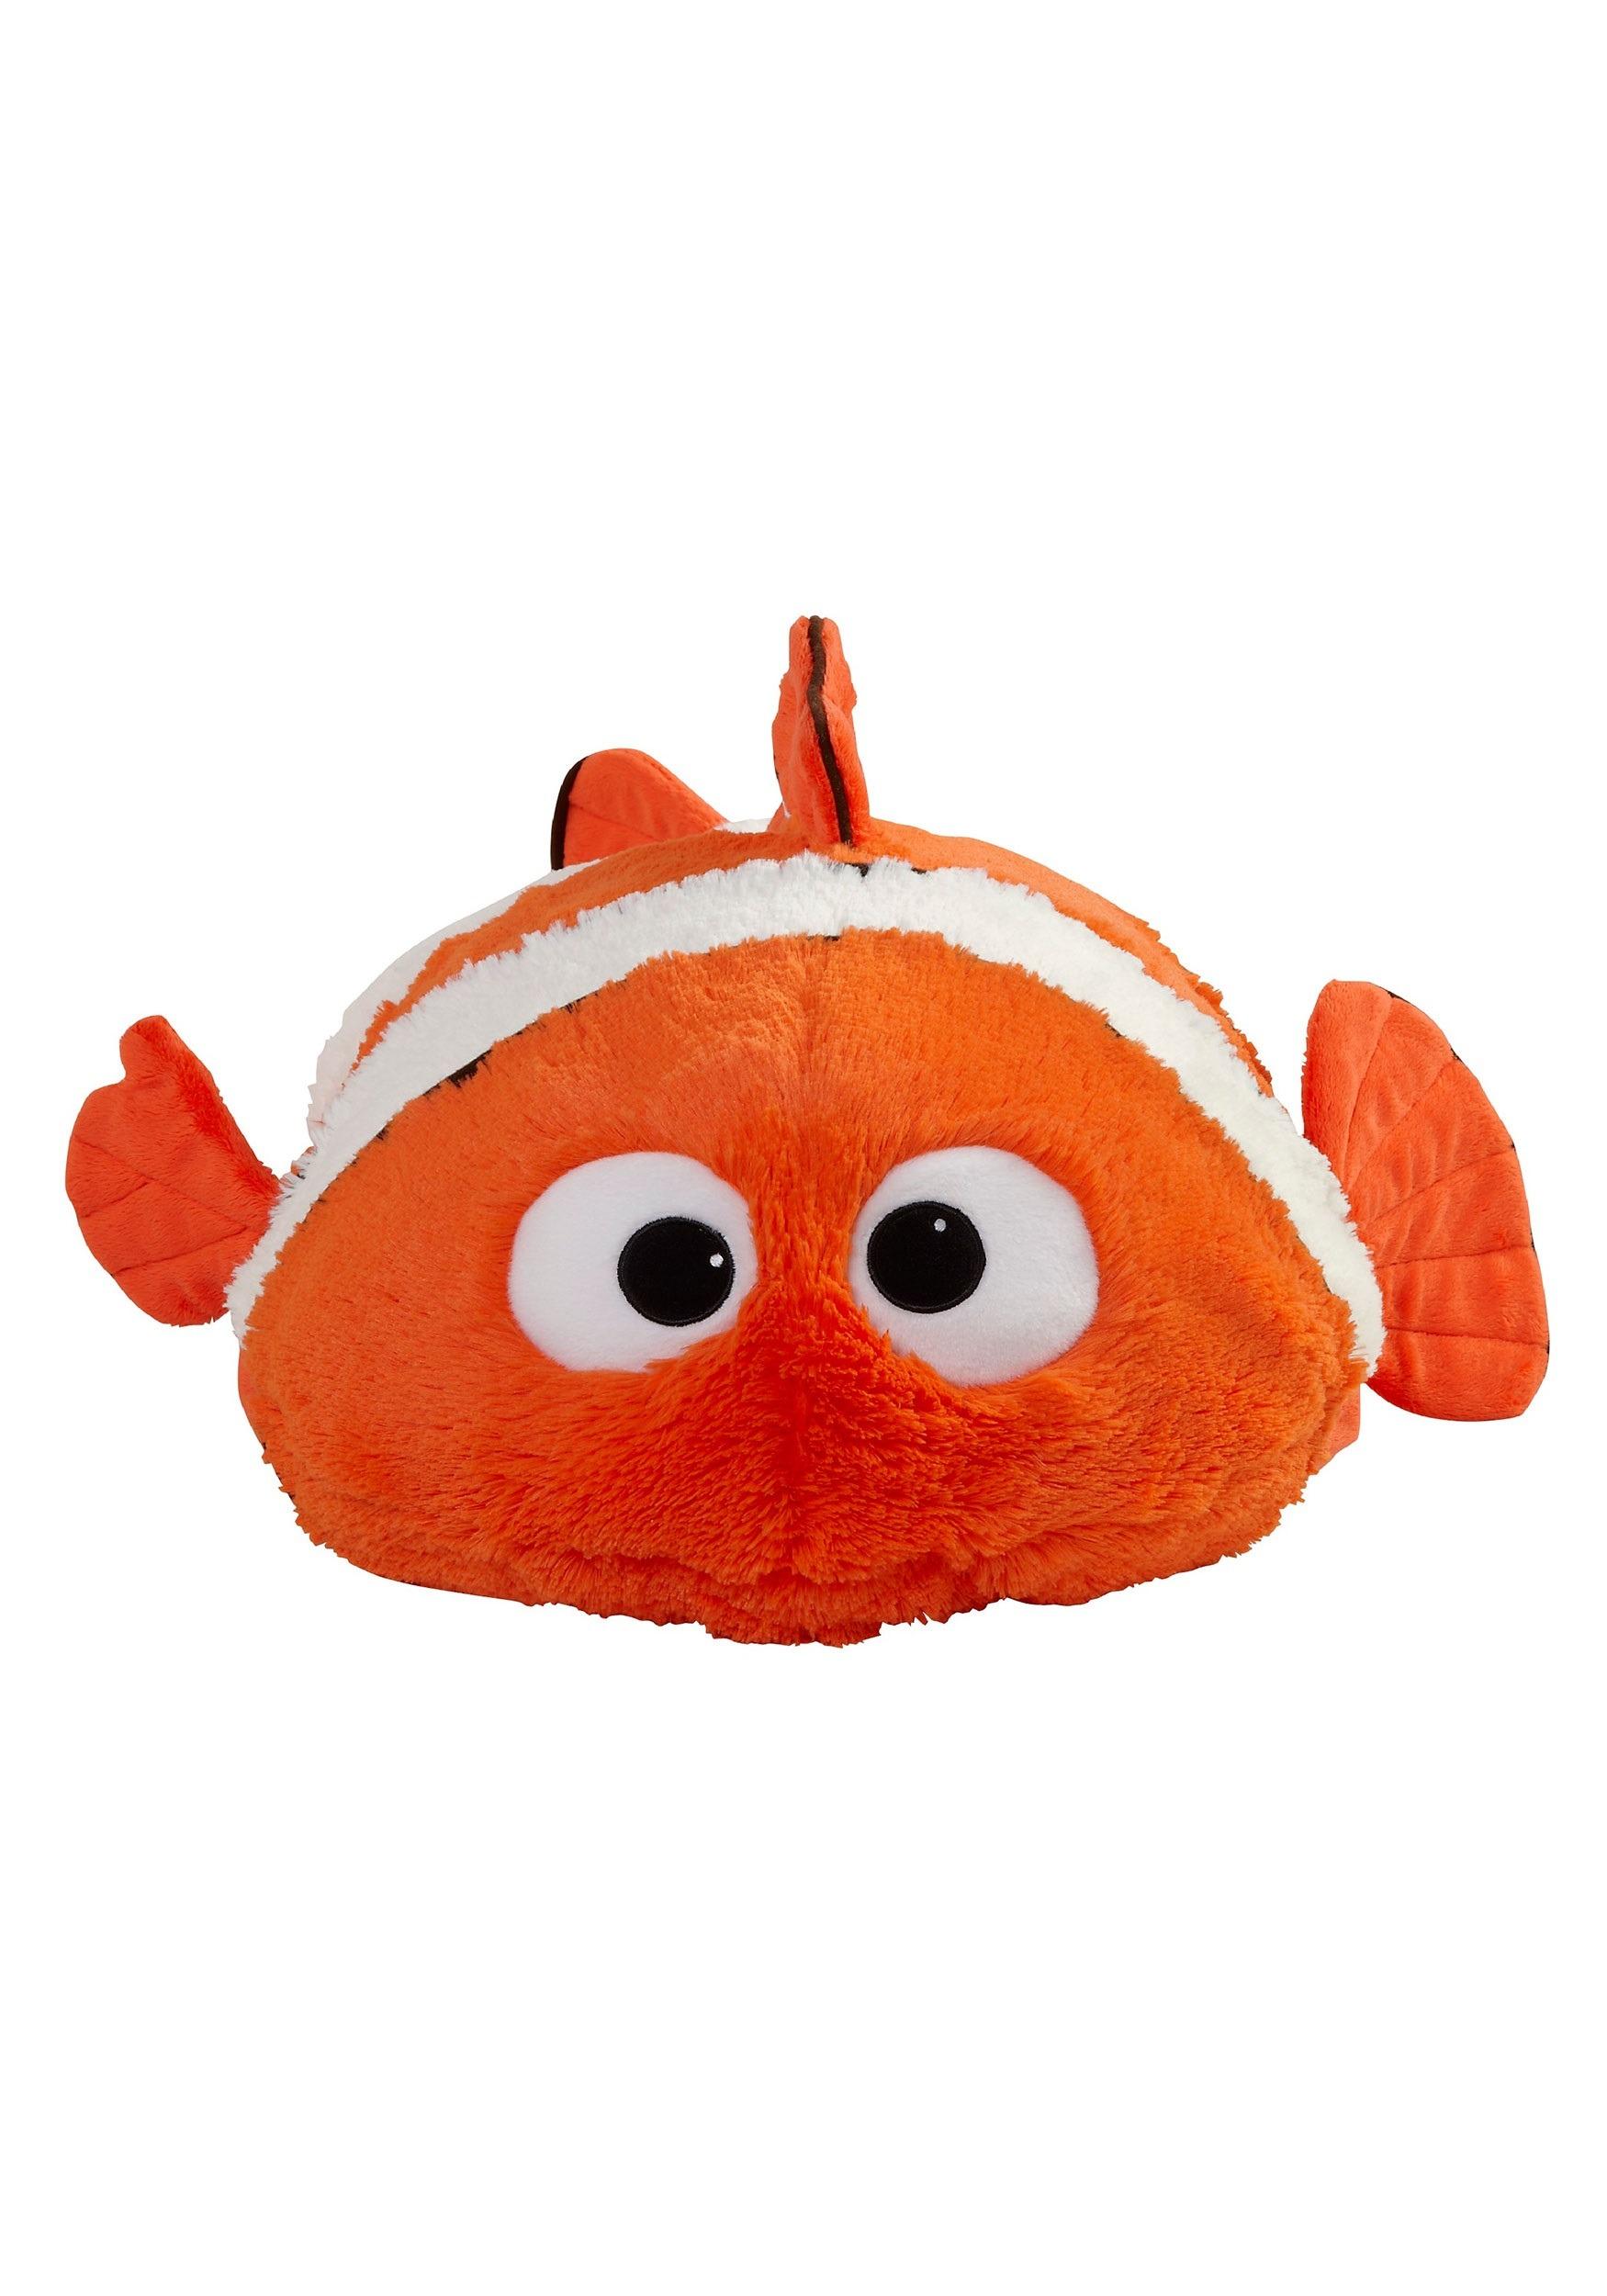 Finding Nemo Jumbo Pillow Pet From Disney Pixar